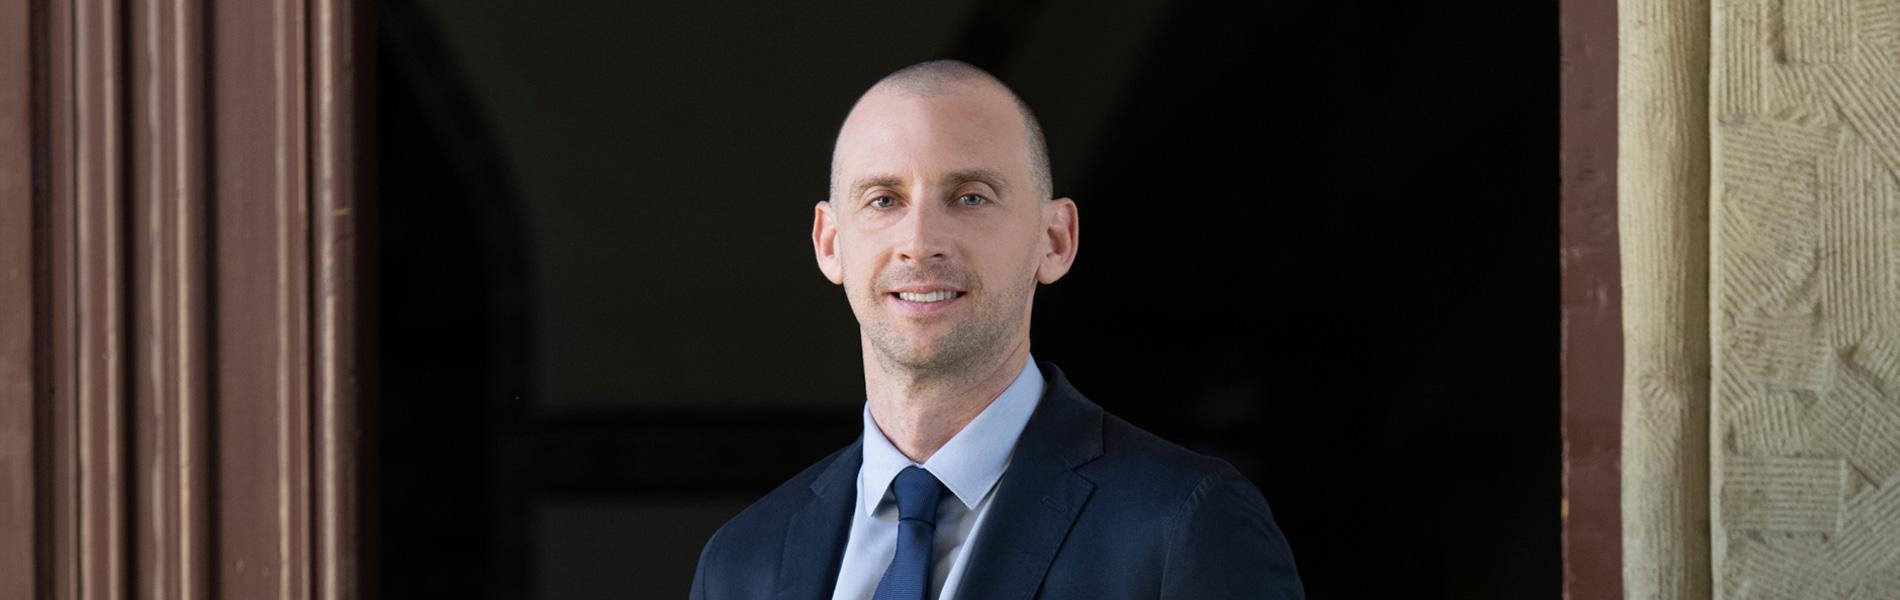 Santa Barbara Criminal Defense Lawyer